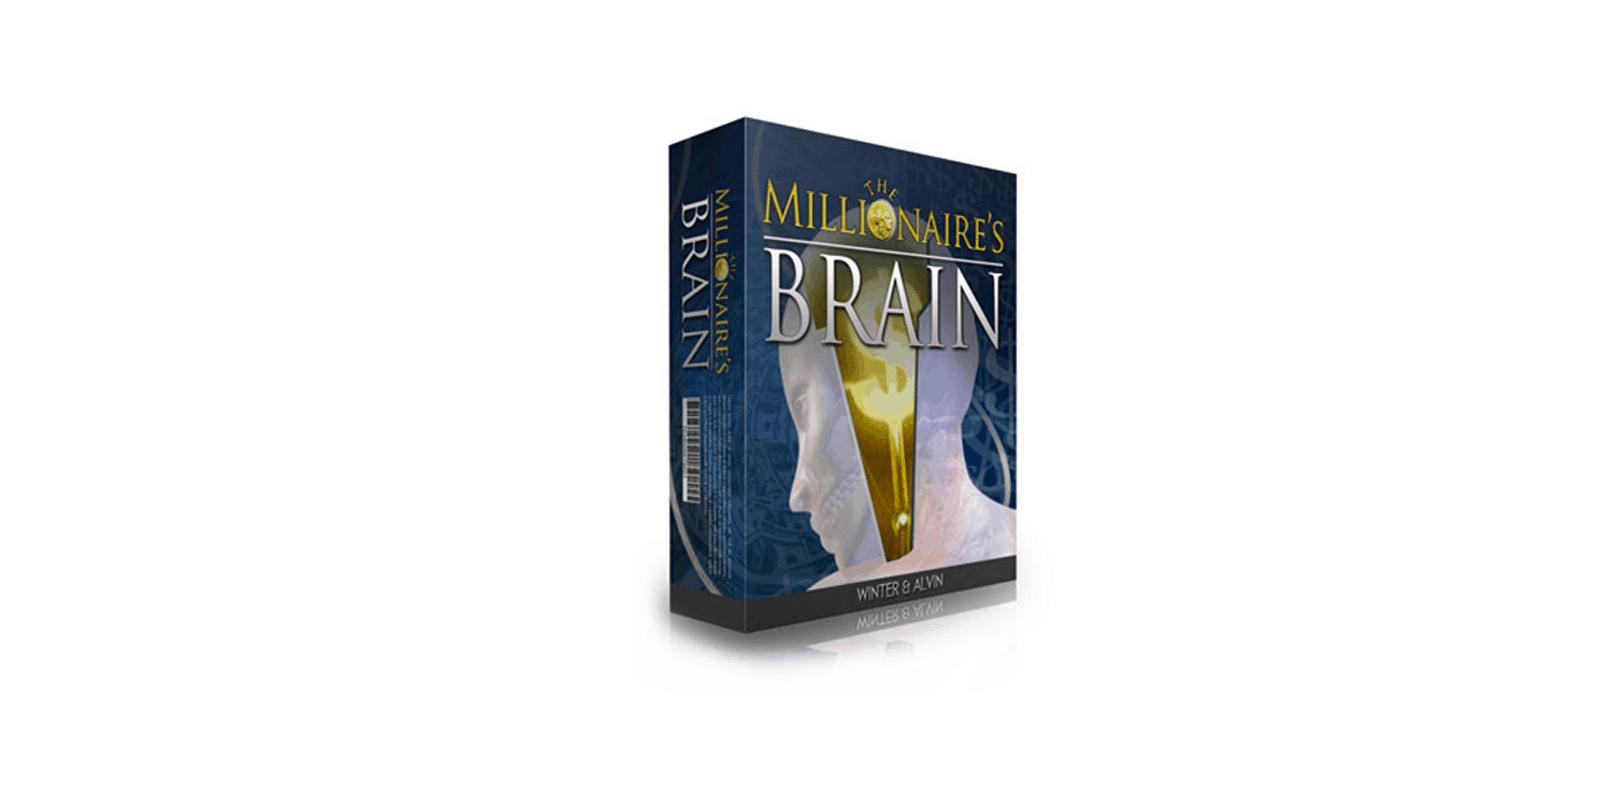 Millionaire's Brain Academy reviews